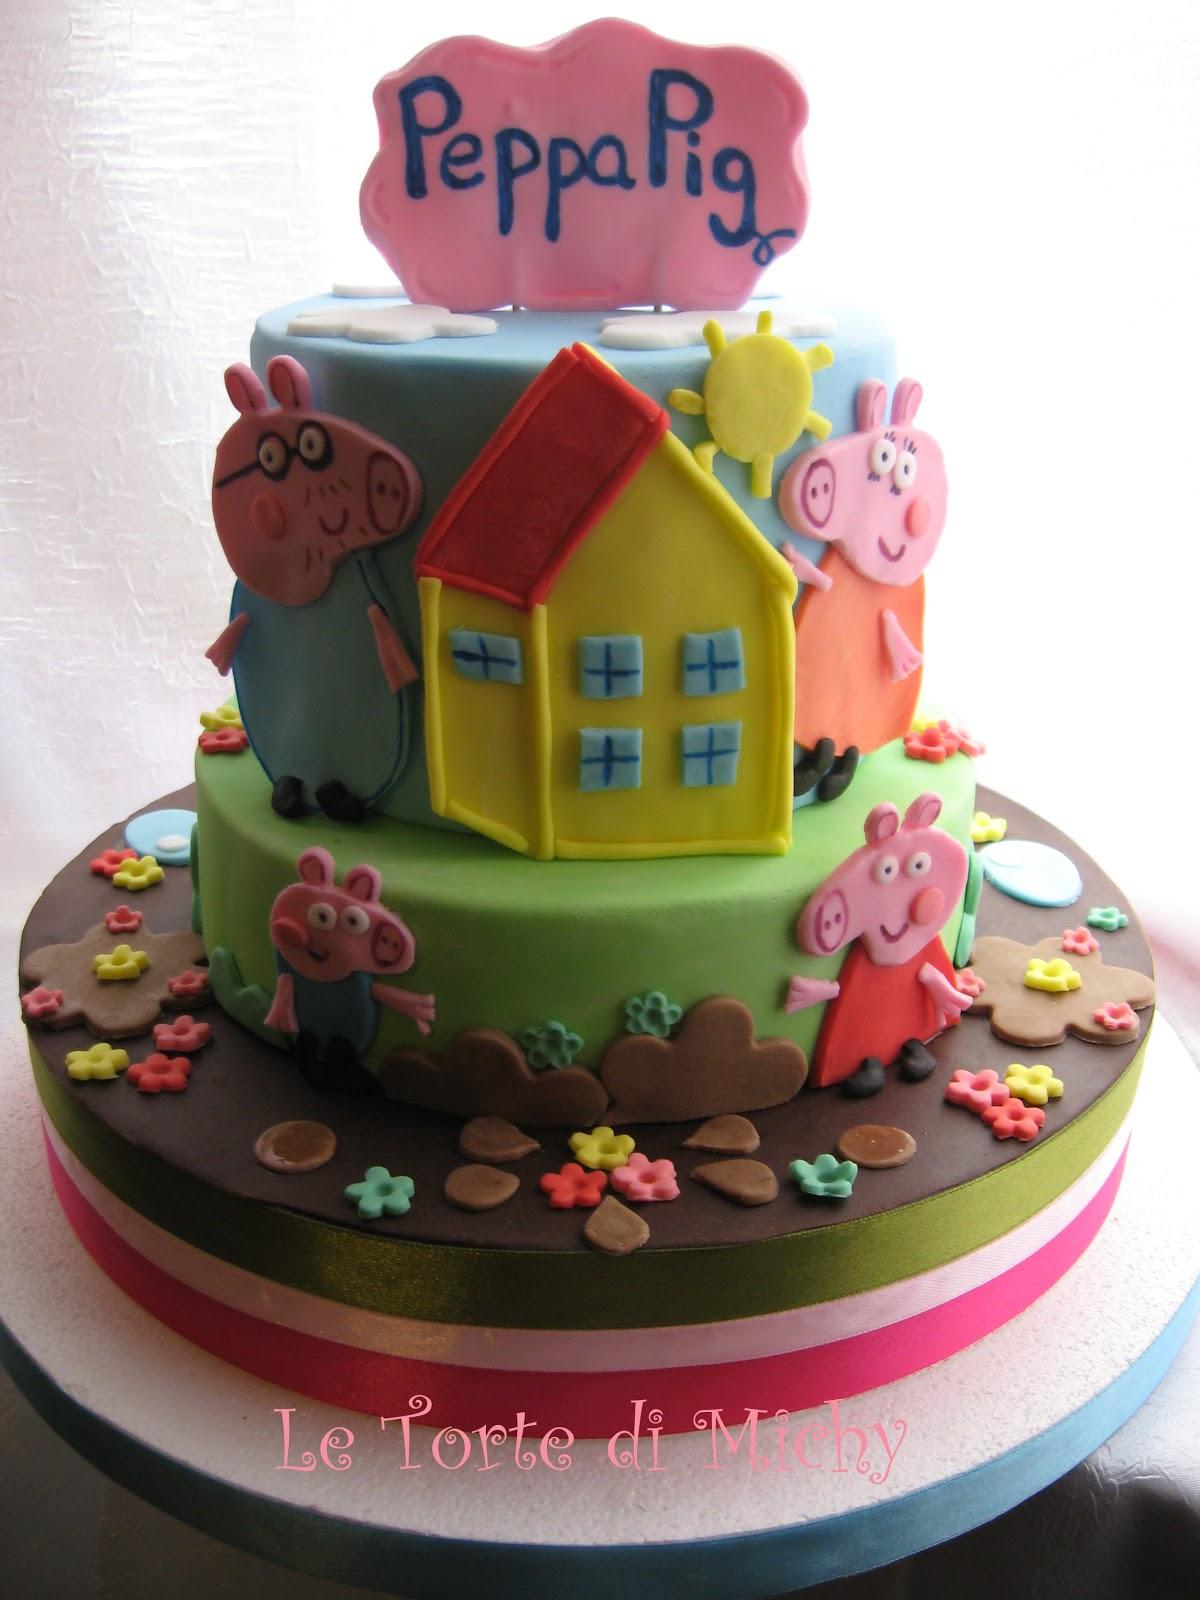 Torta Peppa Pig A Piani Pegga Pig Cake Le Torte Di Michy